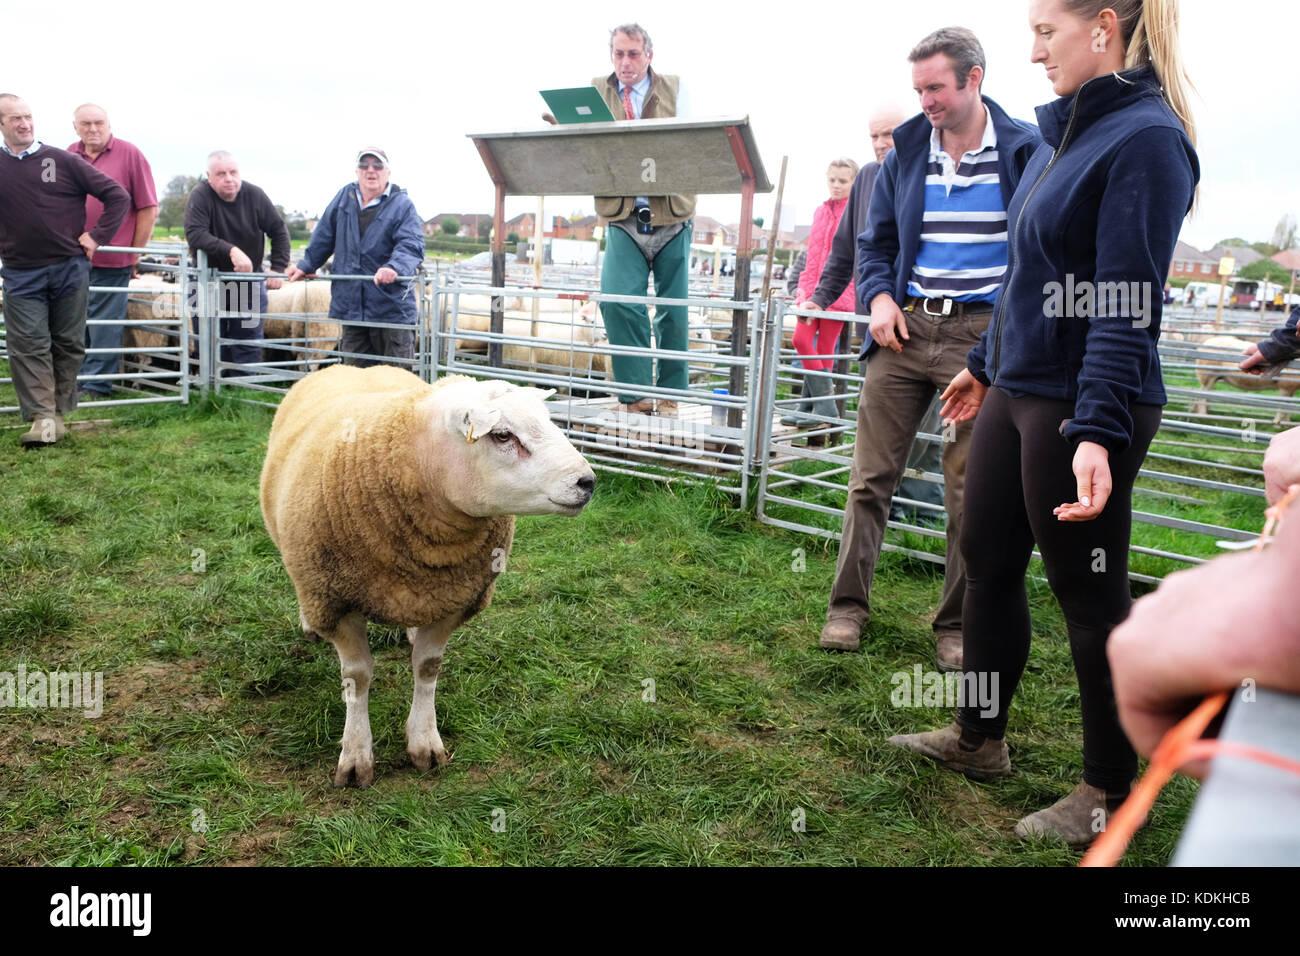 Tenbury Wells, Worcestershire, UK. 14th October, 2017. Sheep auction at Tenbury Wells, Worcestershire, UK - Saturday Stock Photo